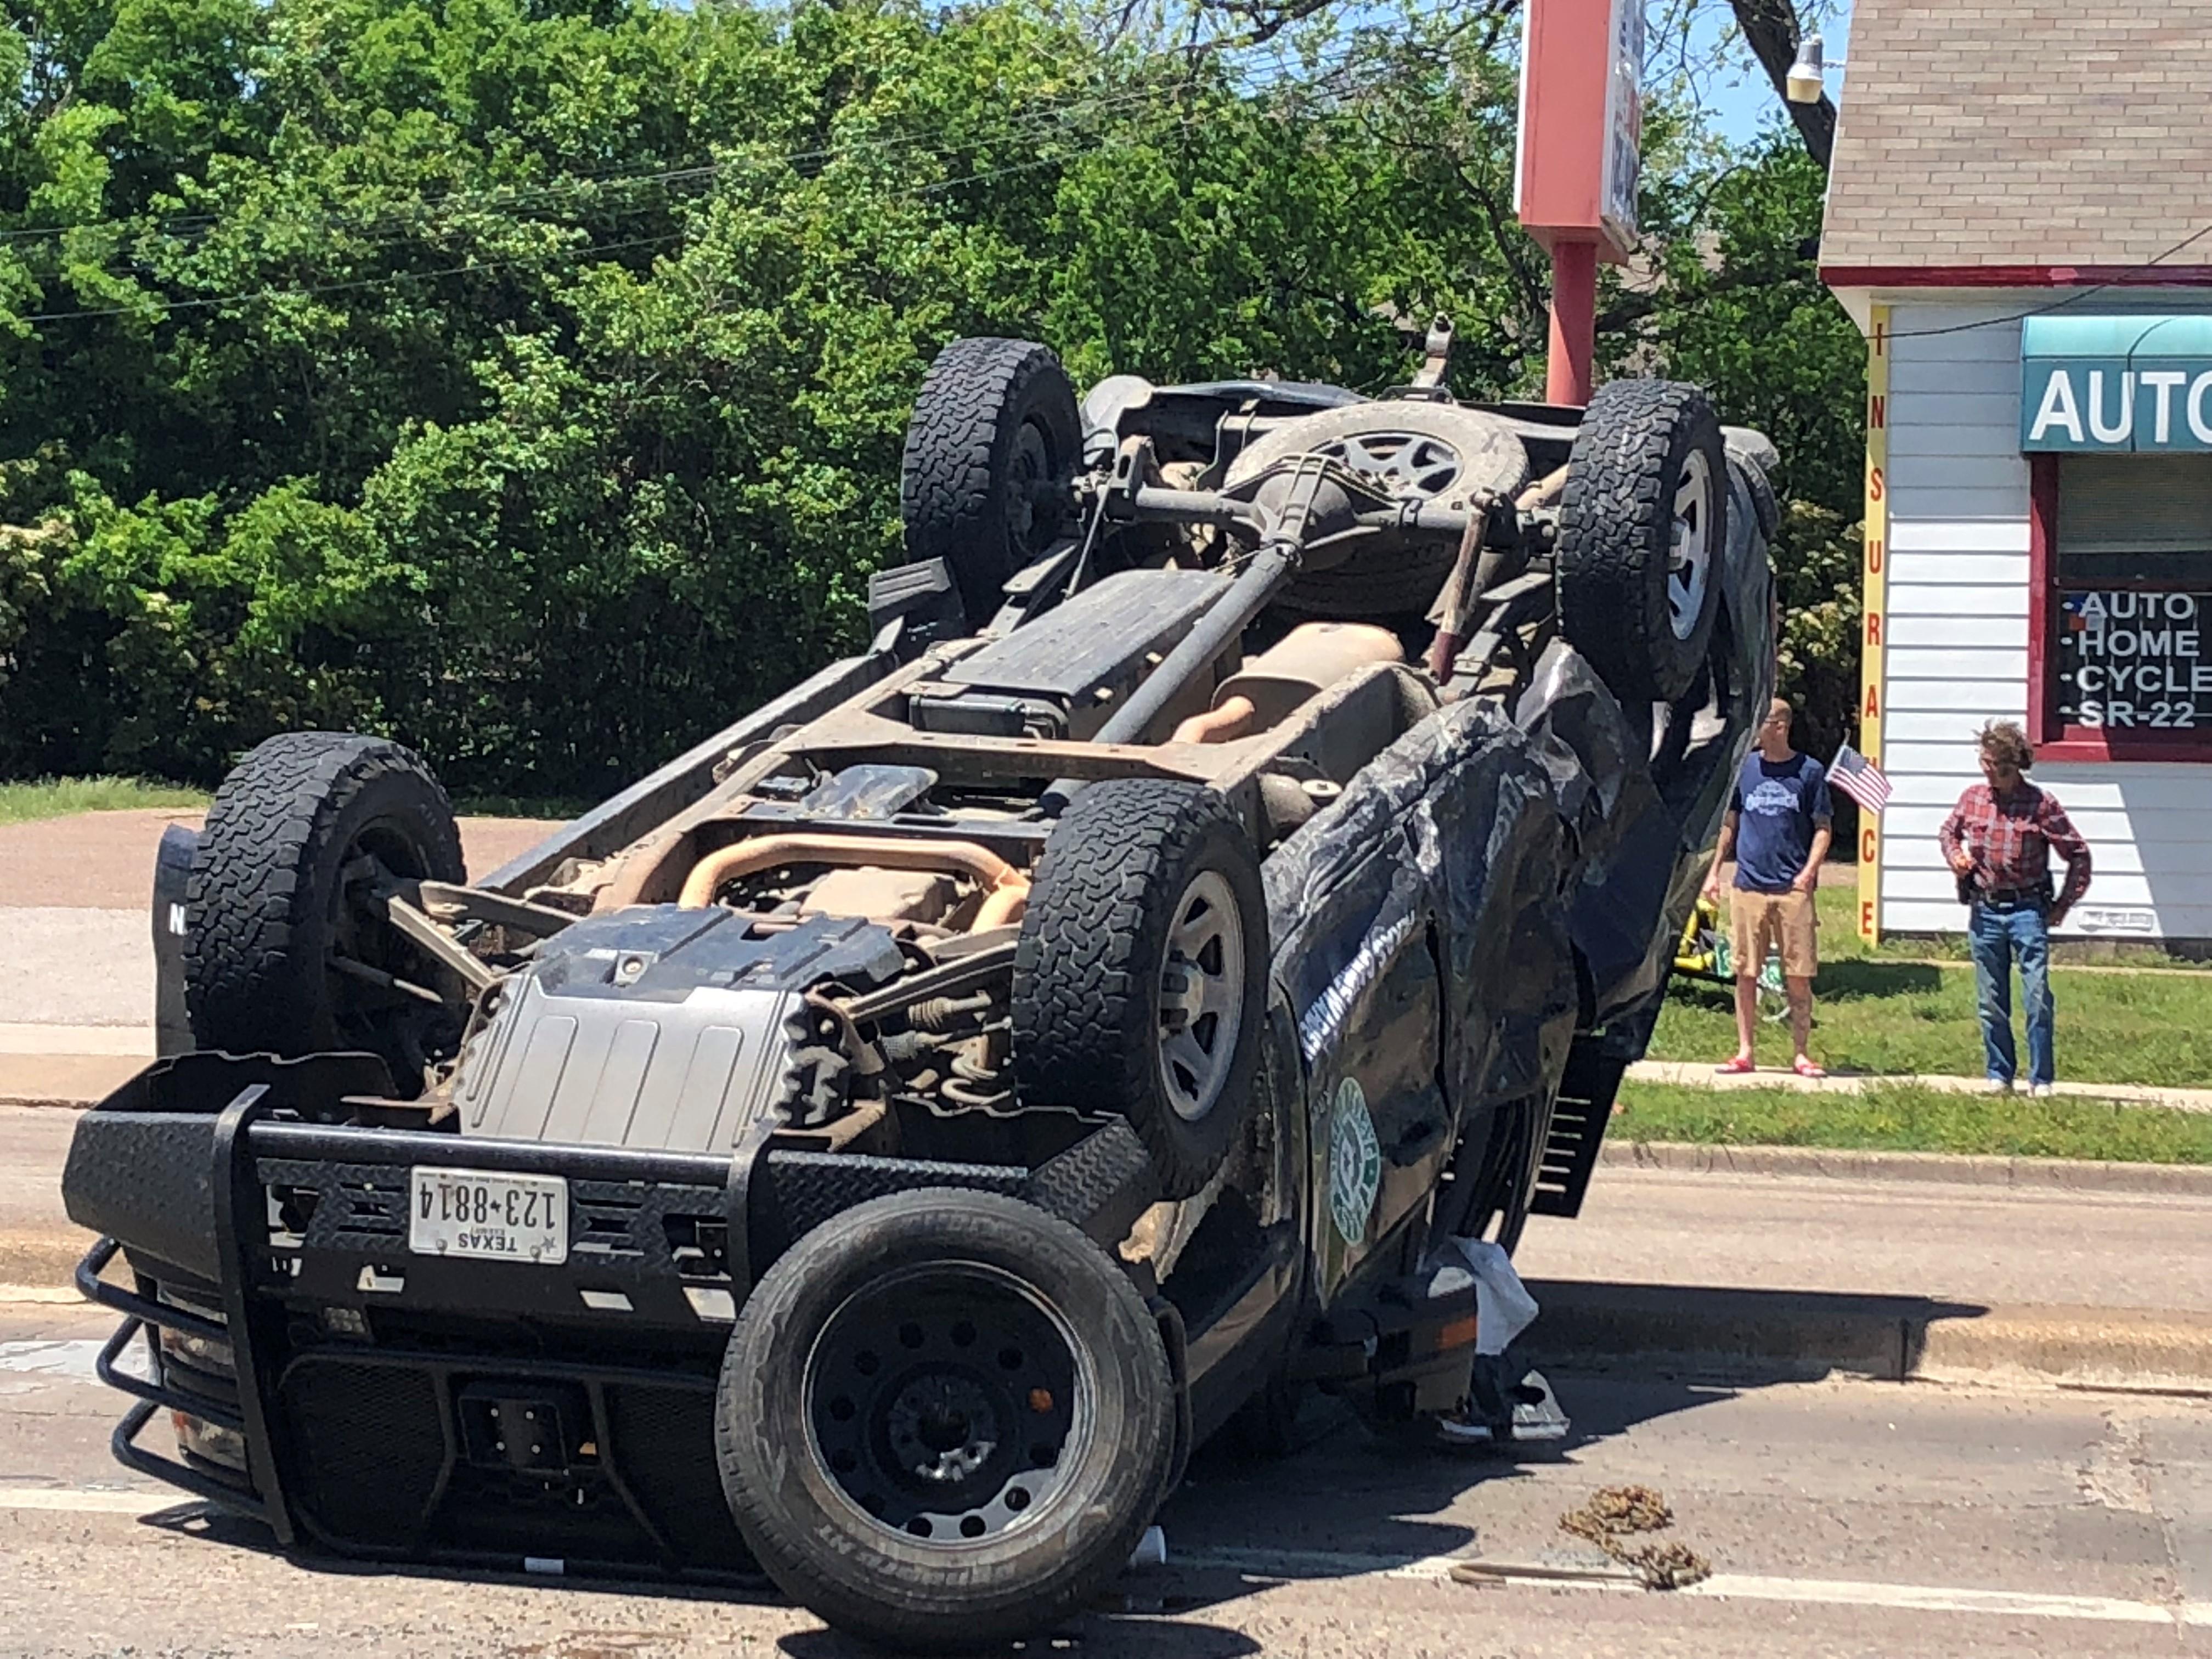 Game Warden Truck Rolls In Waco Dr Crash